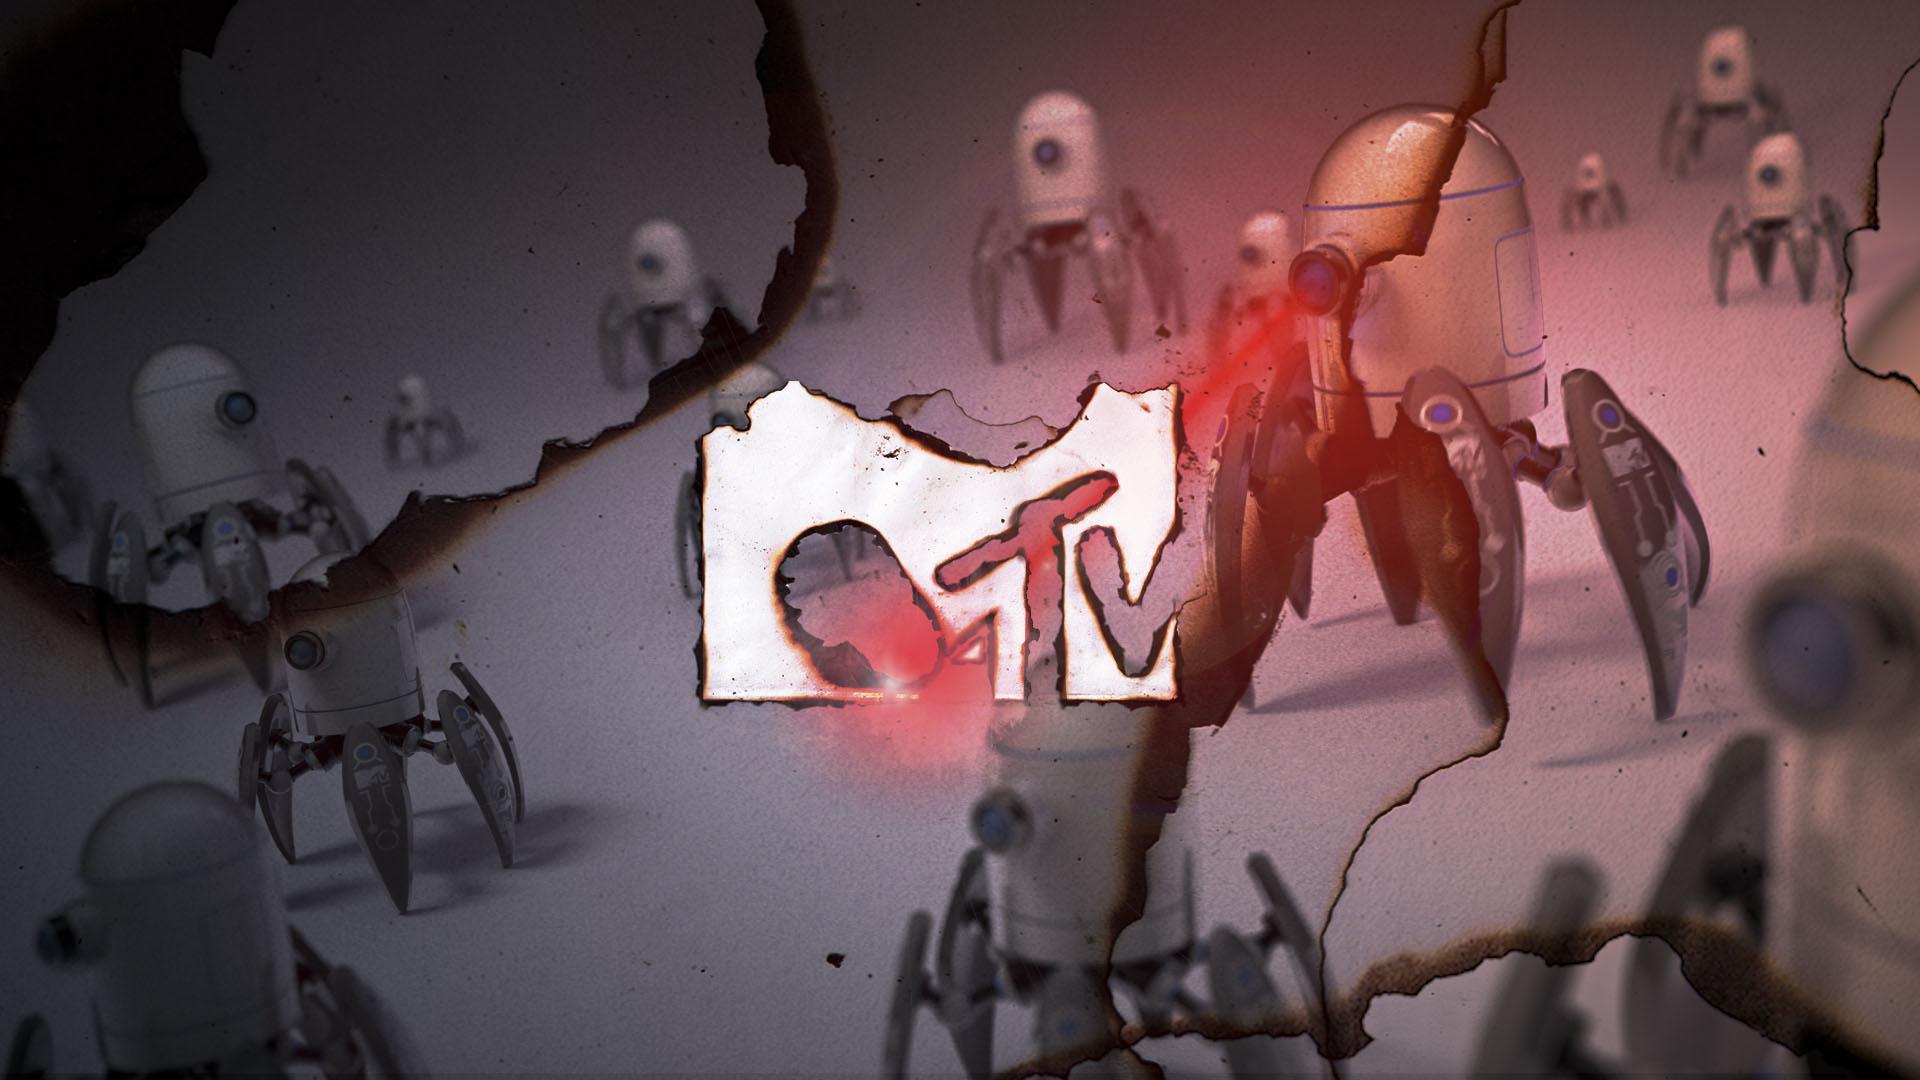 mtv_robots